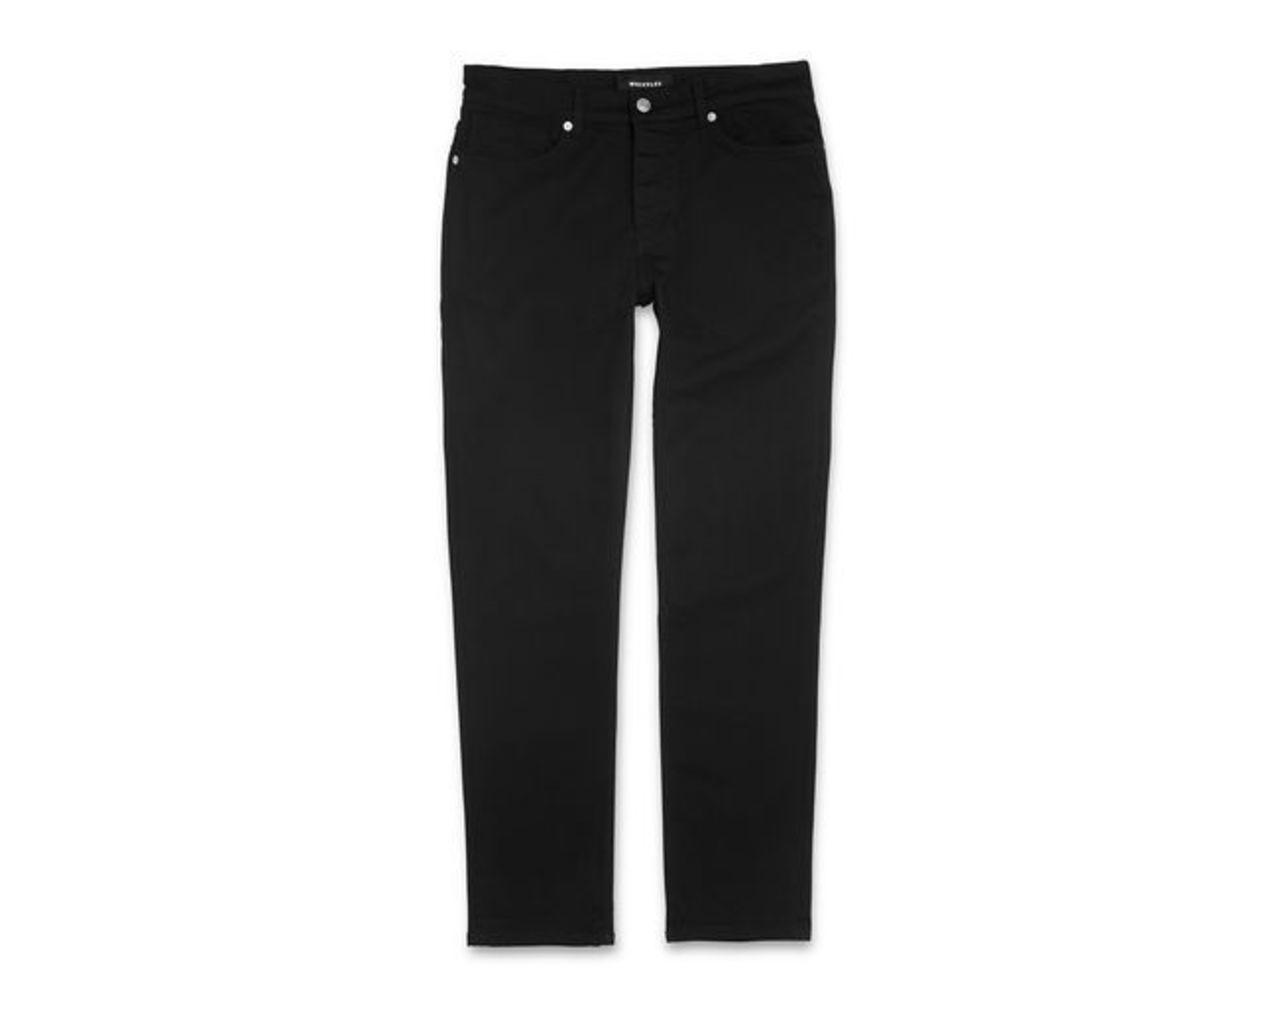 True Black Slim-Fit Jeans